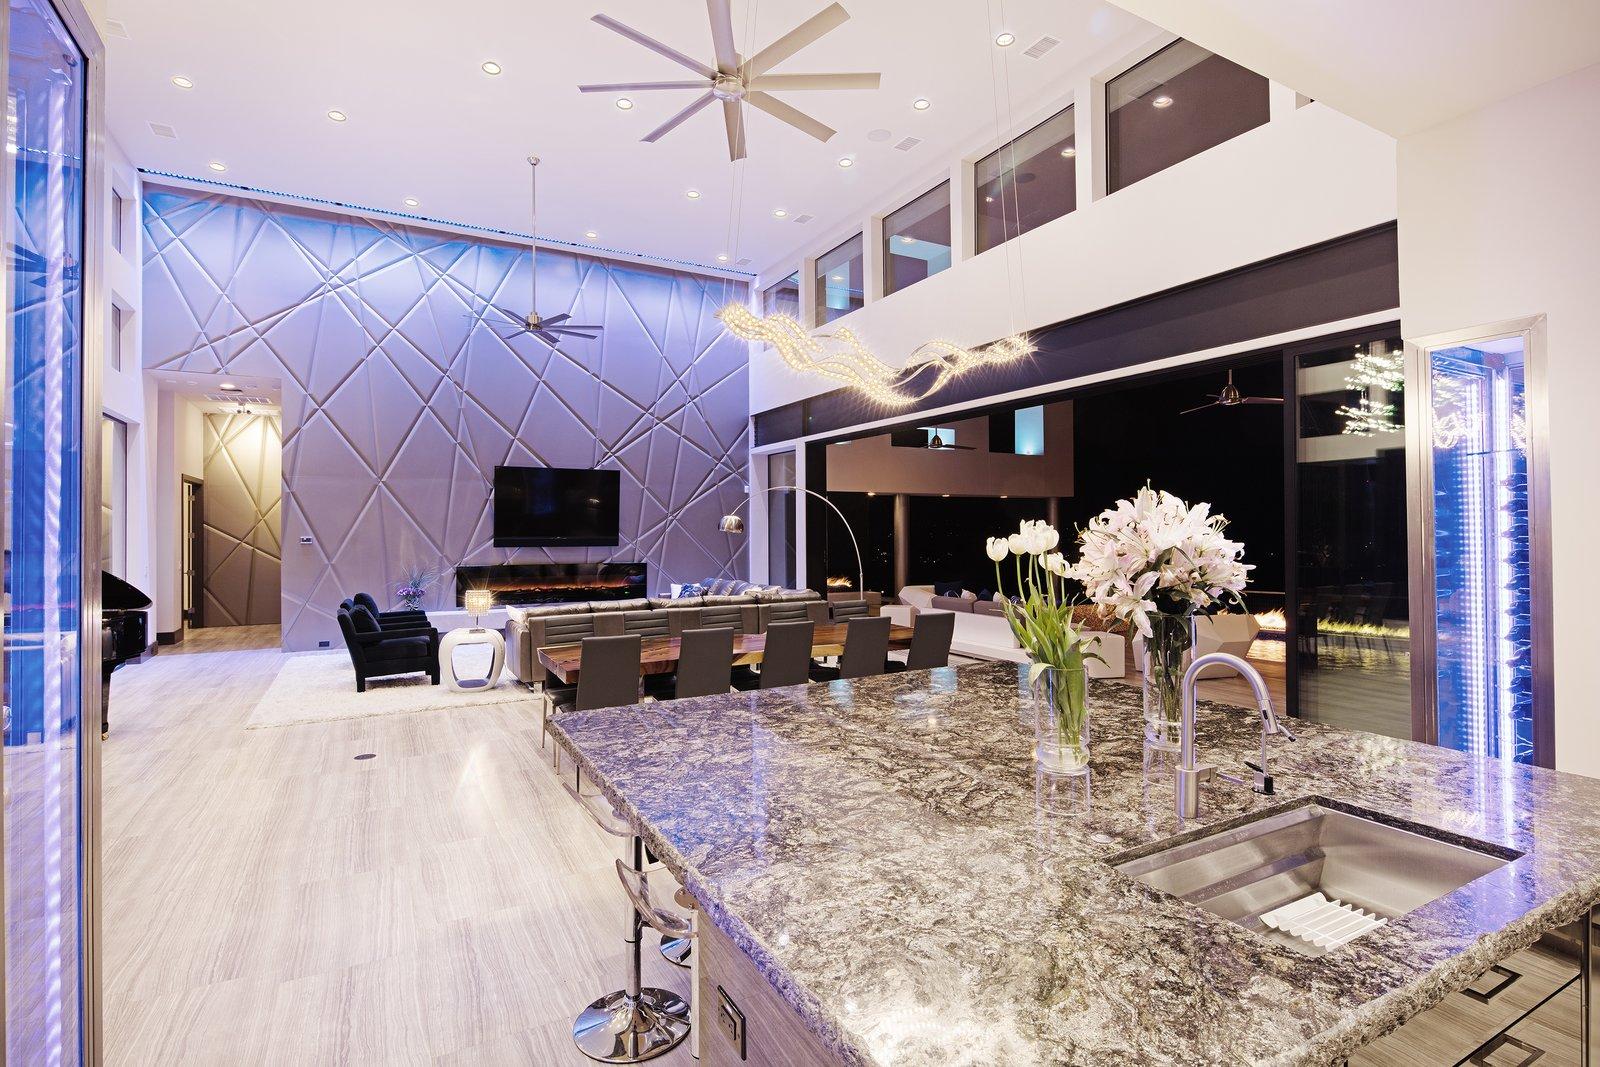 OPEN LIVING DINING KITCHEN  ALTURA HOUSE by OSCAR E FLORES DESIGN STUDIO